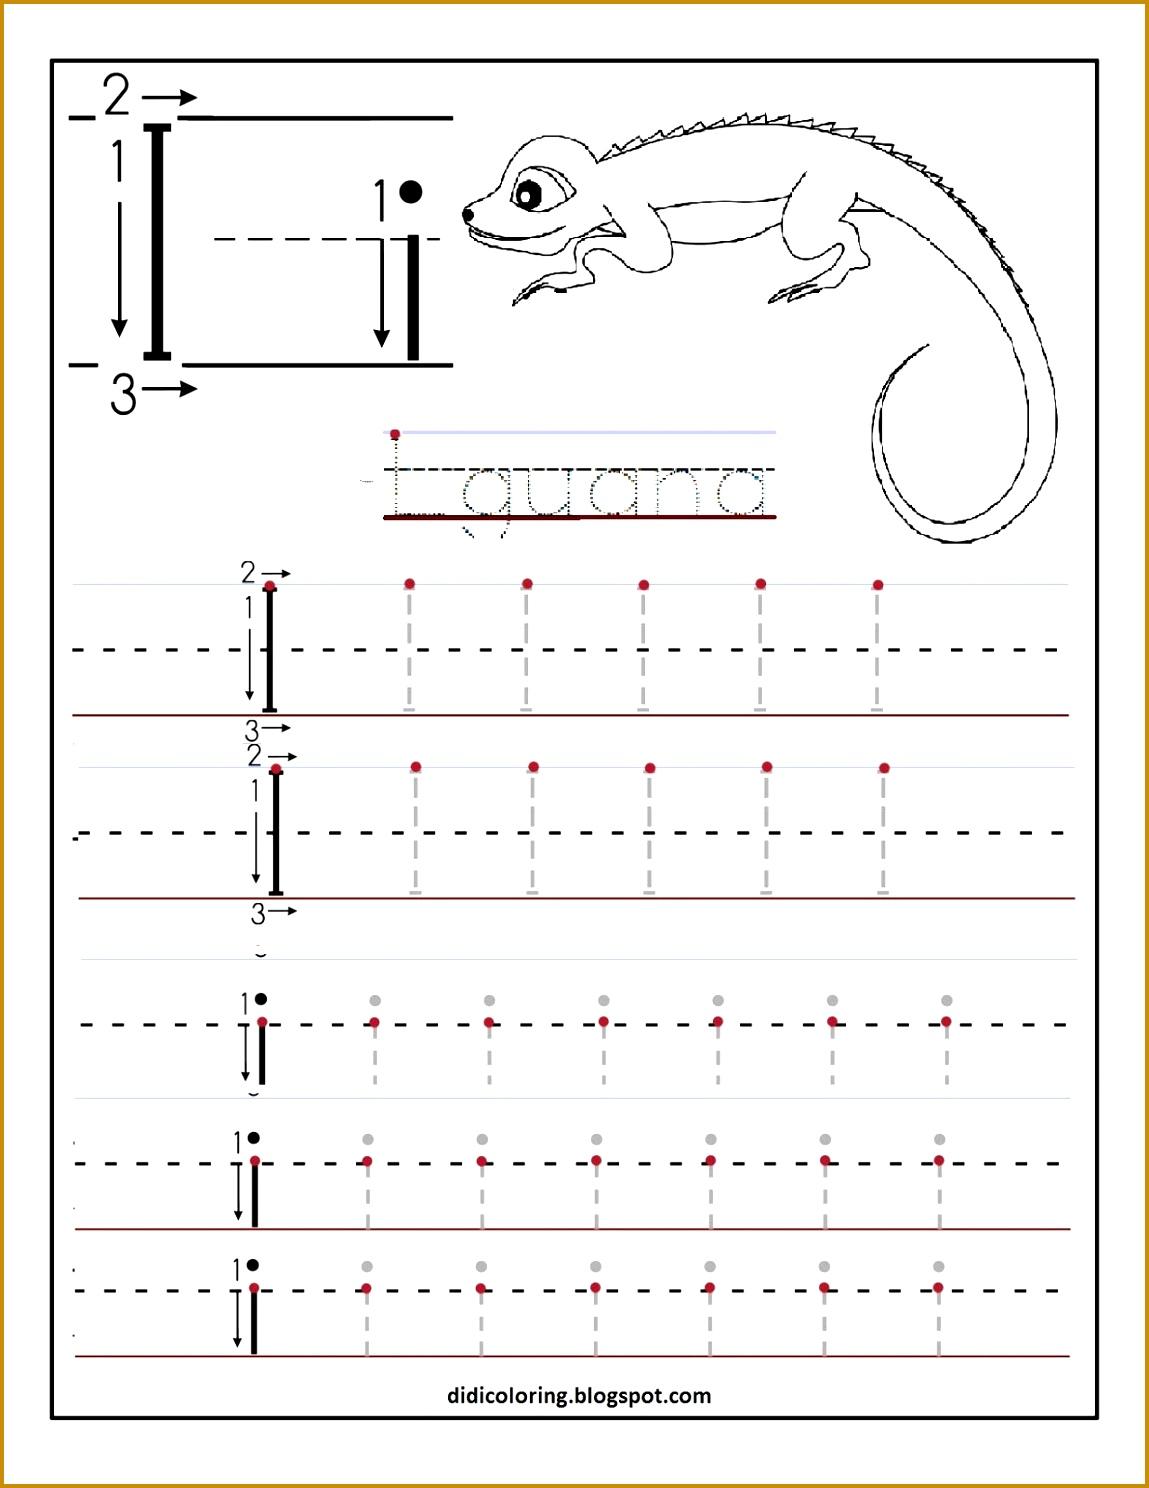 Free Letter Worksheets For Kindergarten X Z Printables Preschoolers U Alphabet Tracing 1280 11491488